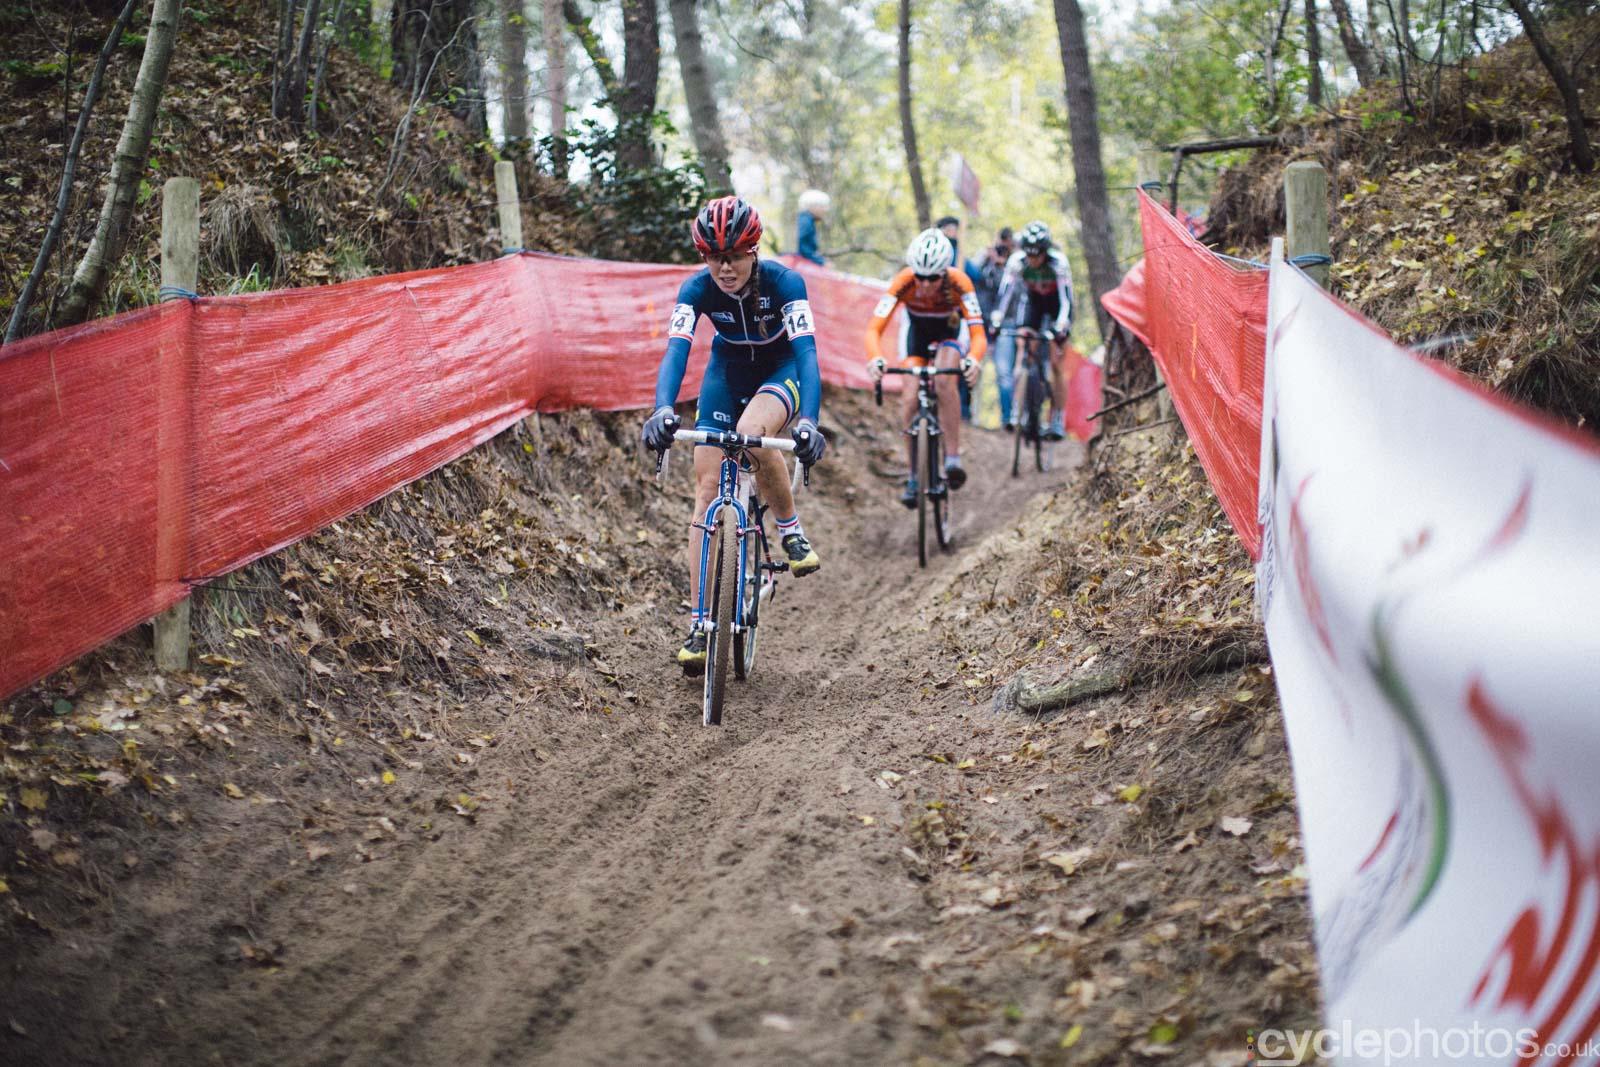 2015-cyclephotos-cyclocross-eucx-huijbergen-112804-maelle-grossetete